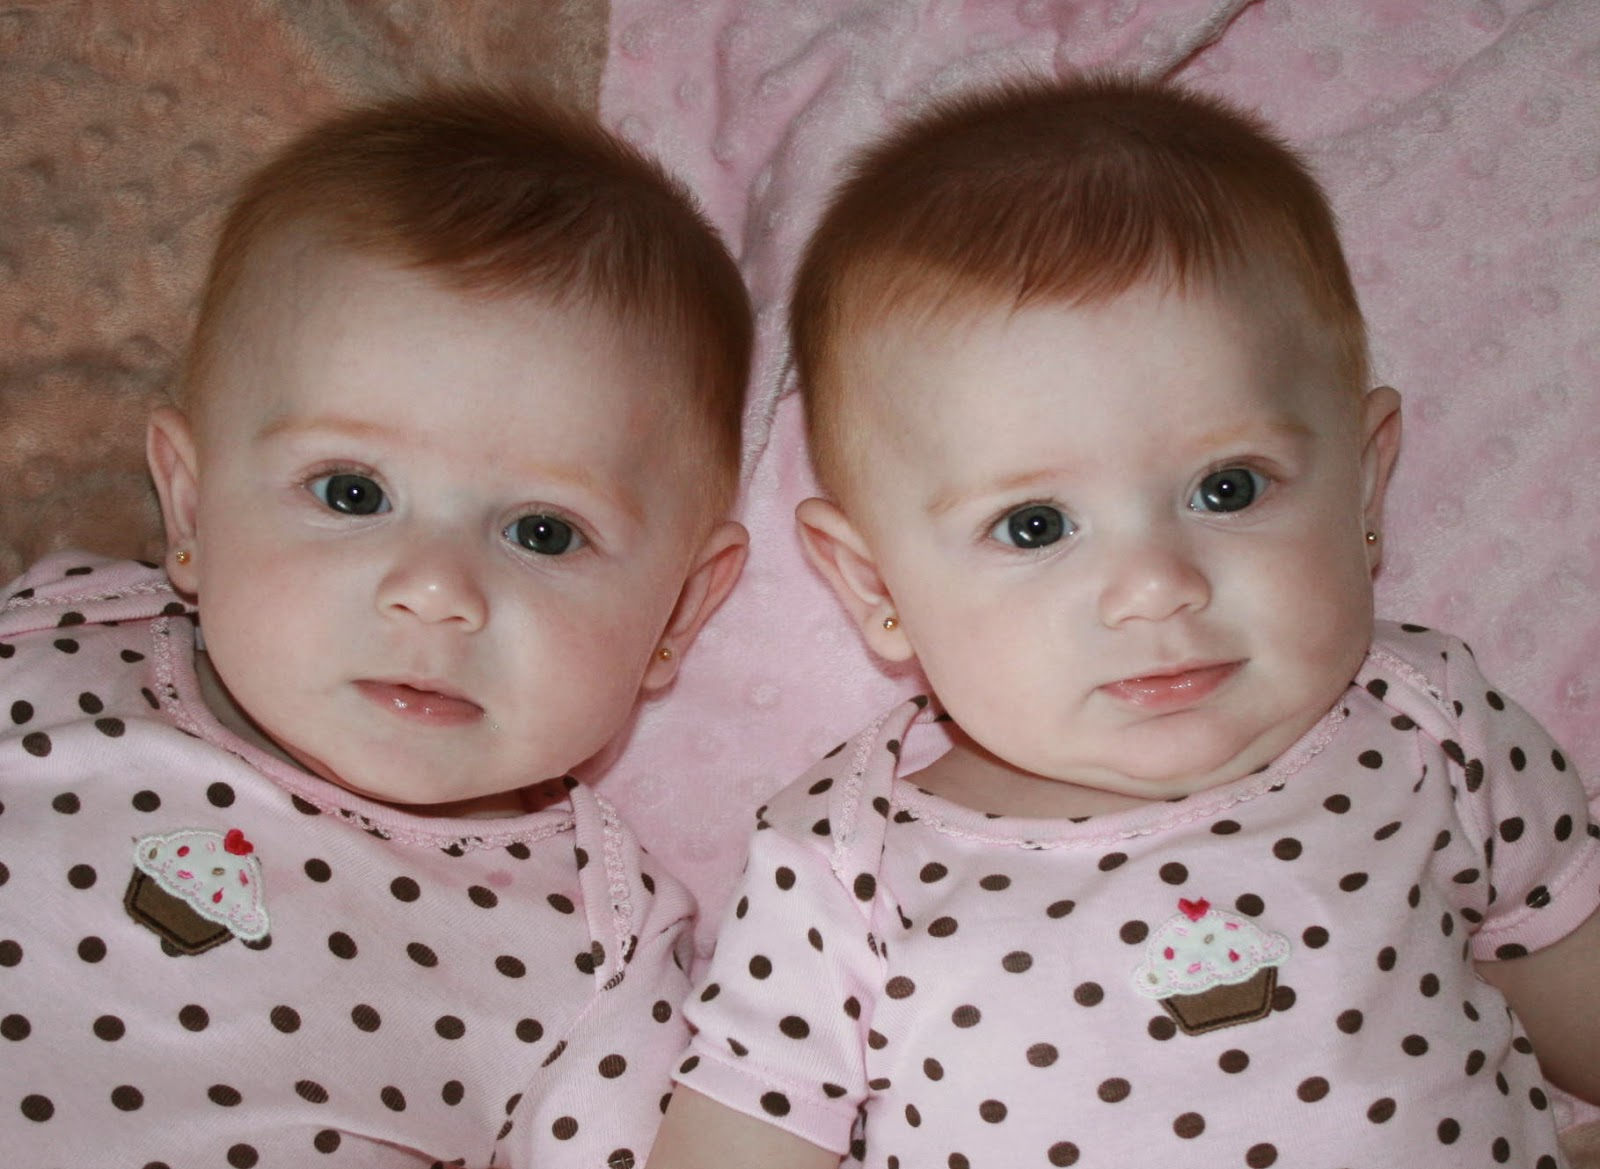 Girls Wallpaper 2015: Twin Girls Baby HD Wallpapers 2015 ...